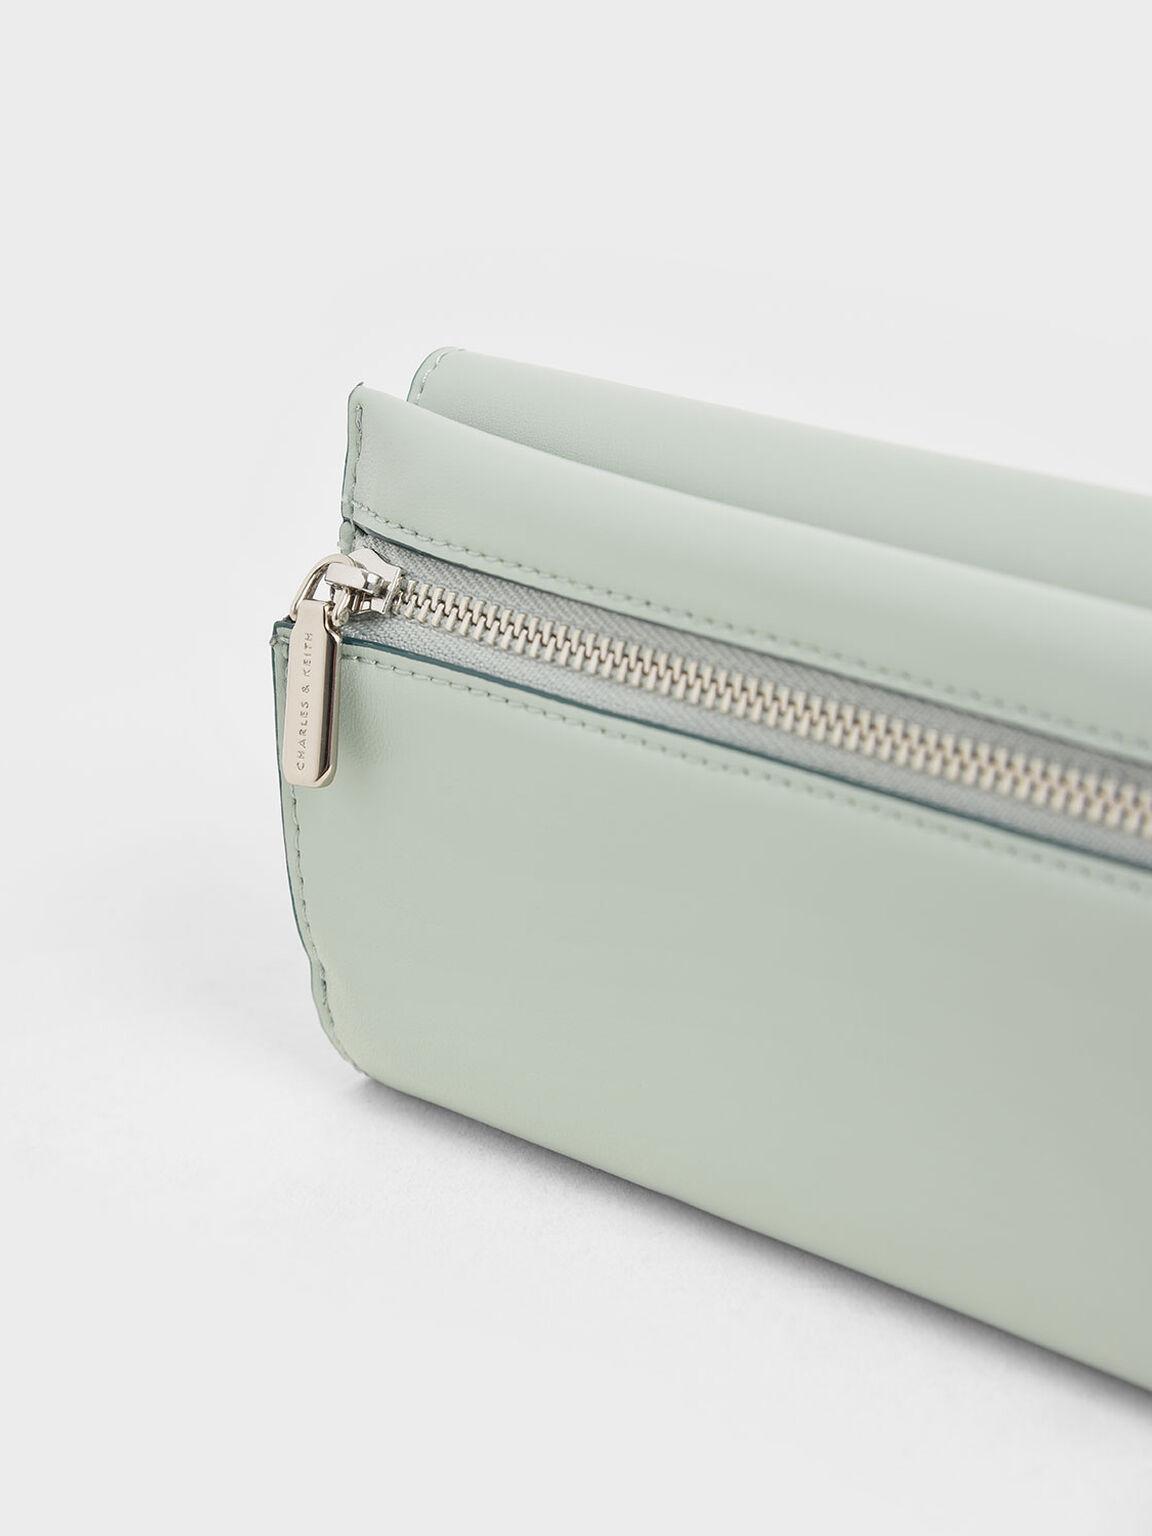 Mini Metal Push Lock Wallet, Mint Green, hi-res